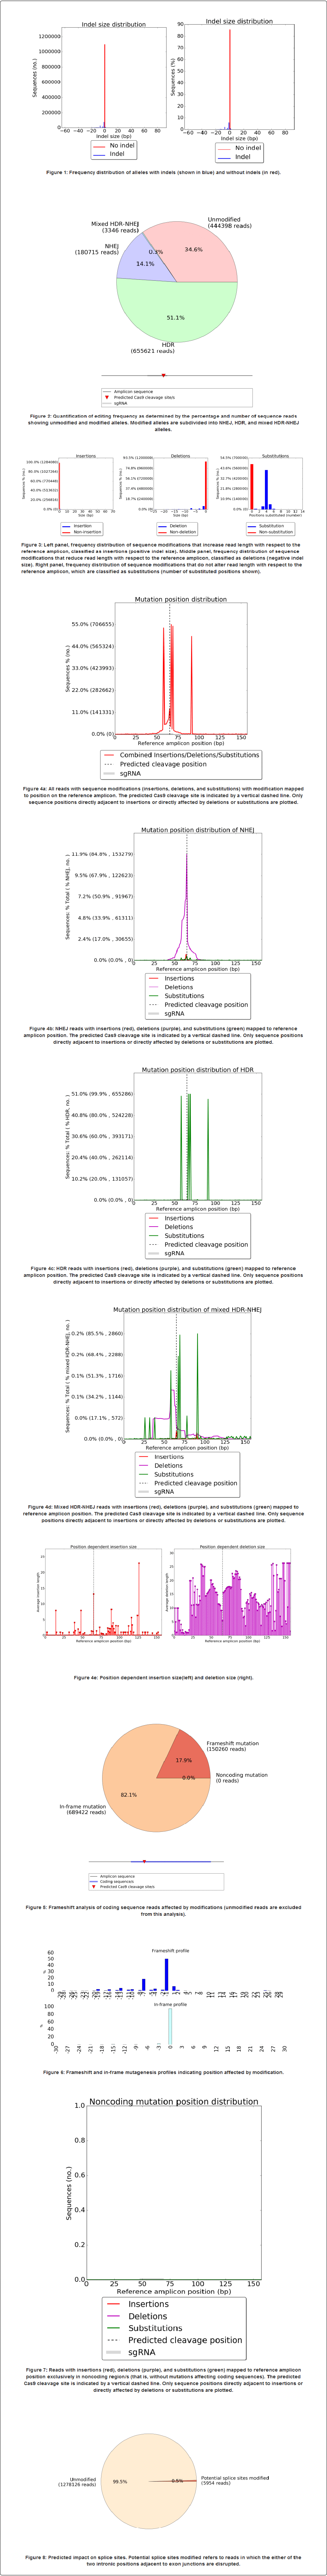 https://github.com/lucapinello/CRISPResso/blob/master/CRISPResso_output.png?raw=true